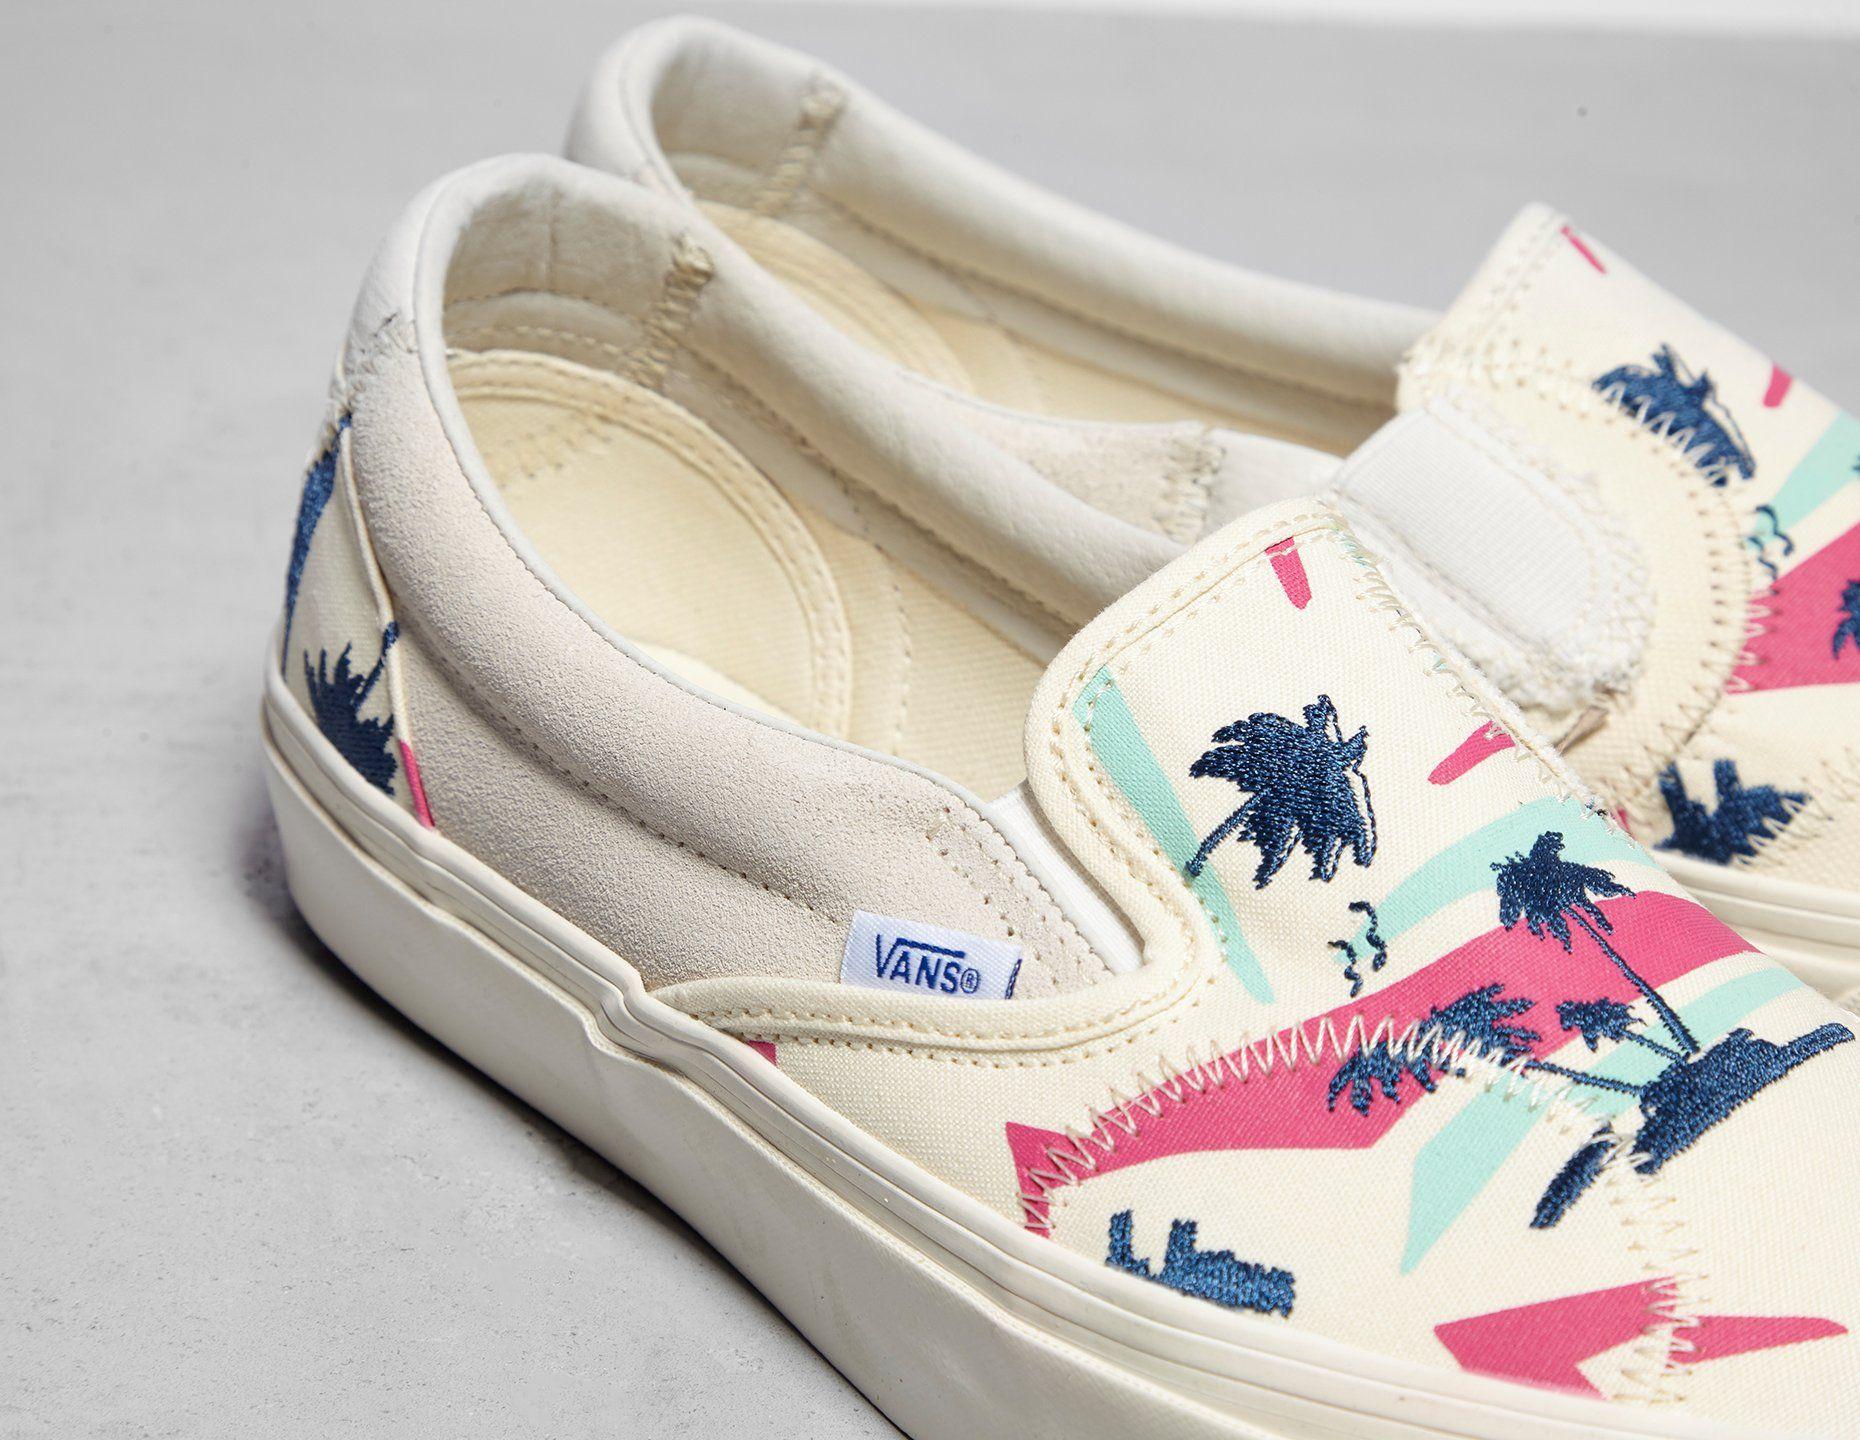 Vans Slip On Bricolage LX 'Embroidered Palm'